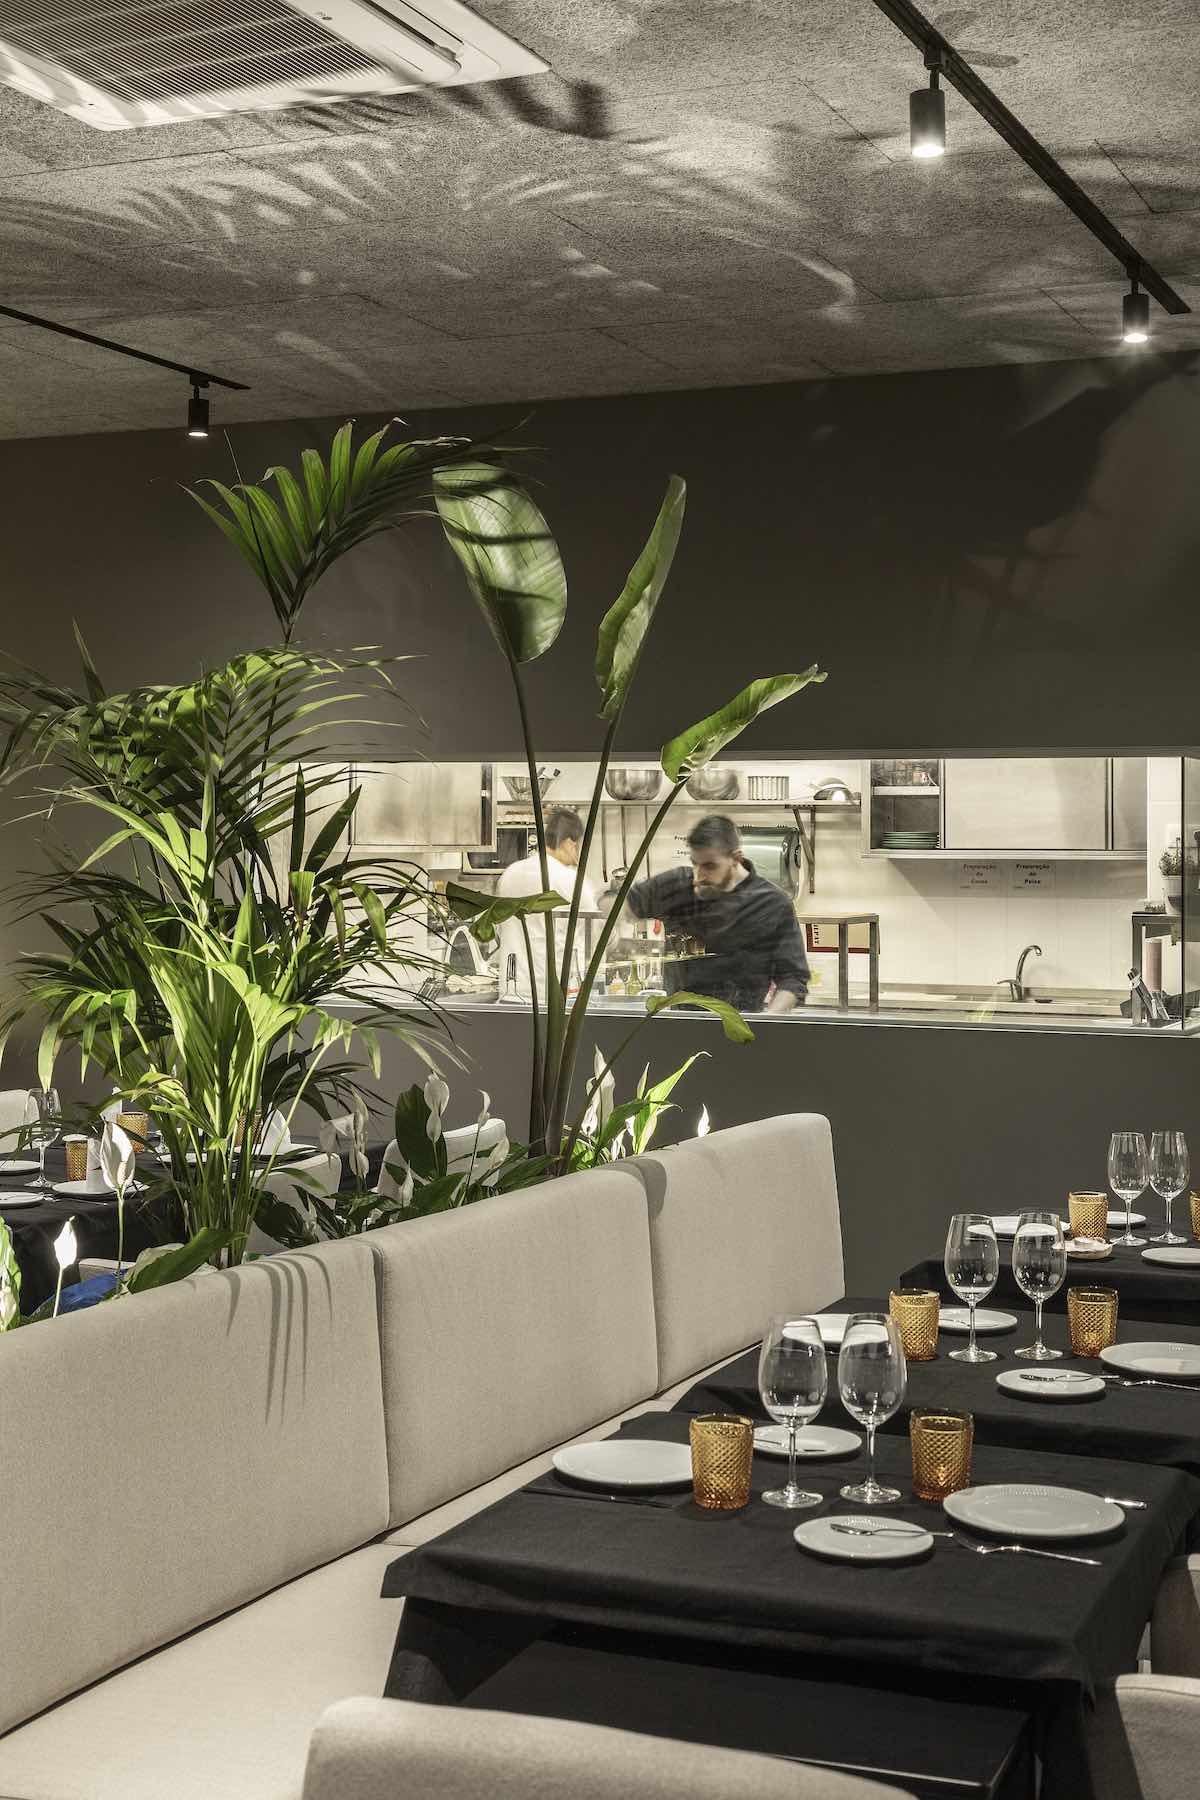 FAMA_Restaurant_Paulo_Martins_Arquitectura_and_design_AmazingArchitecture_%20019.jpg